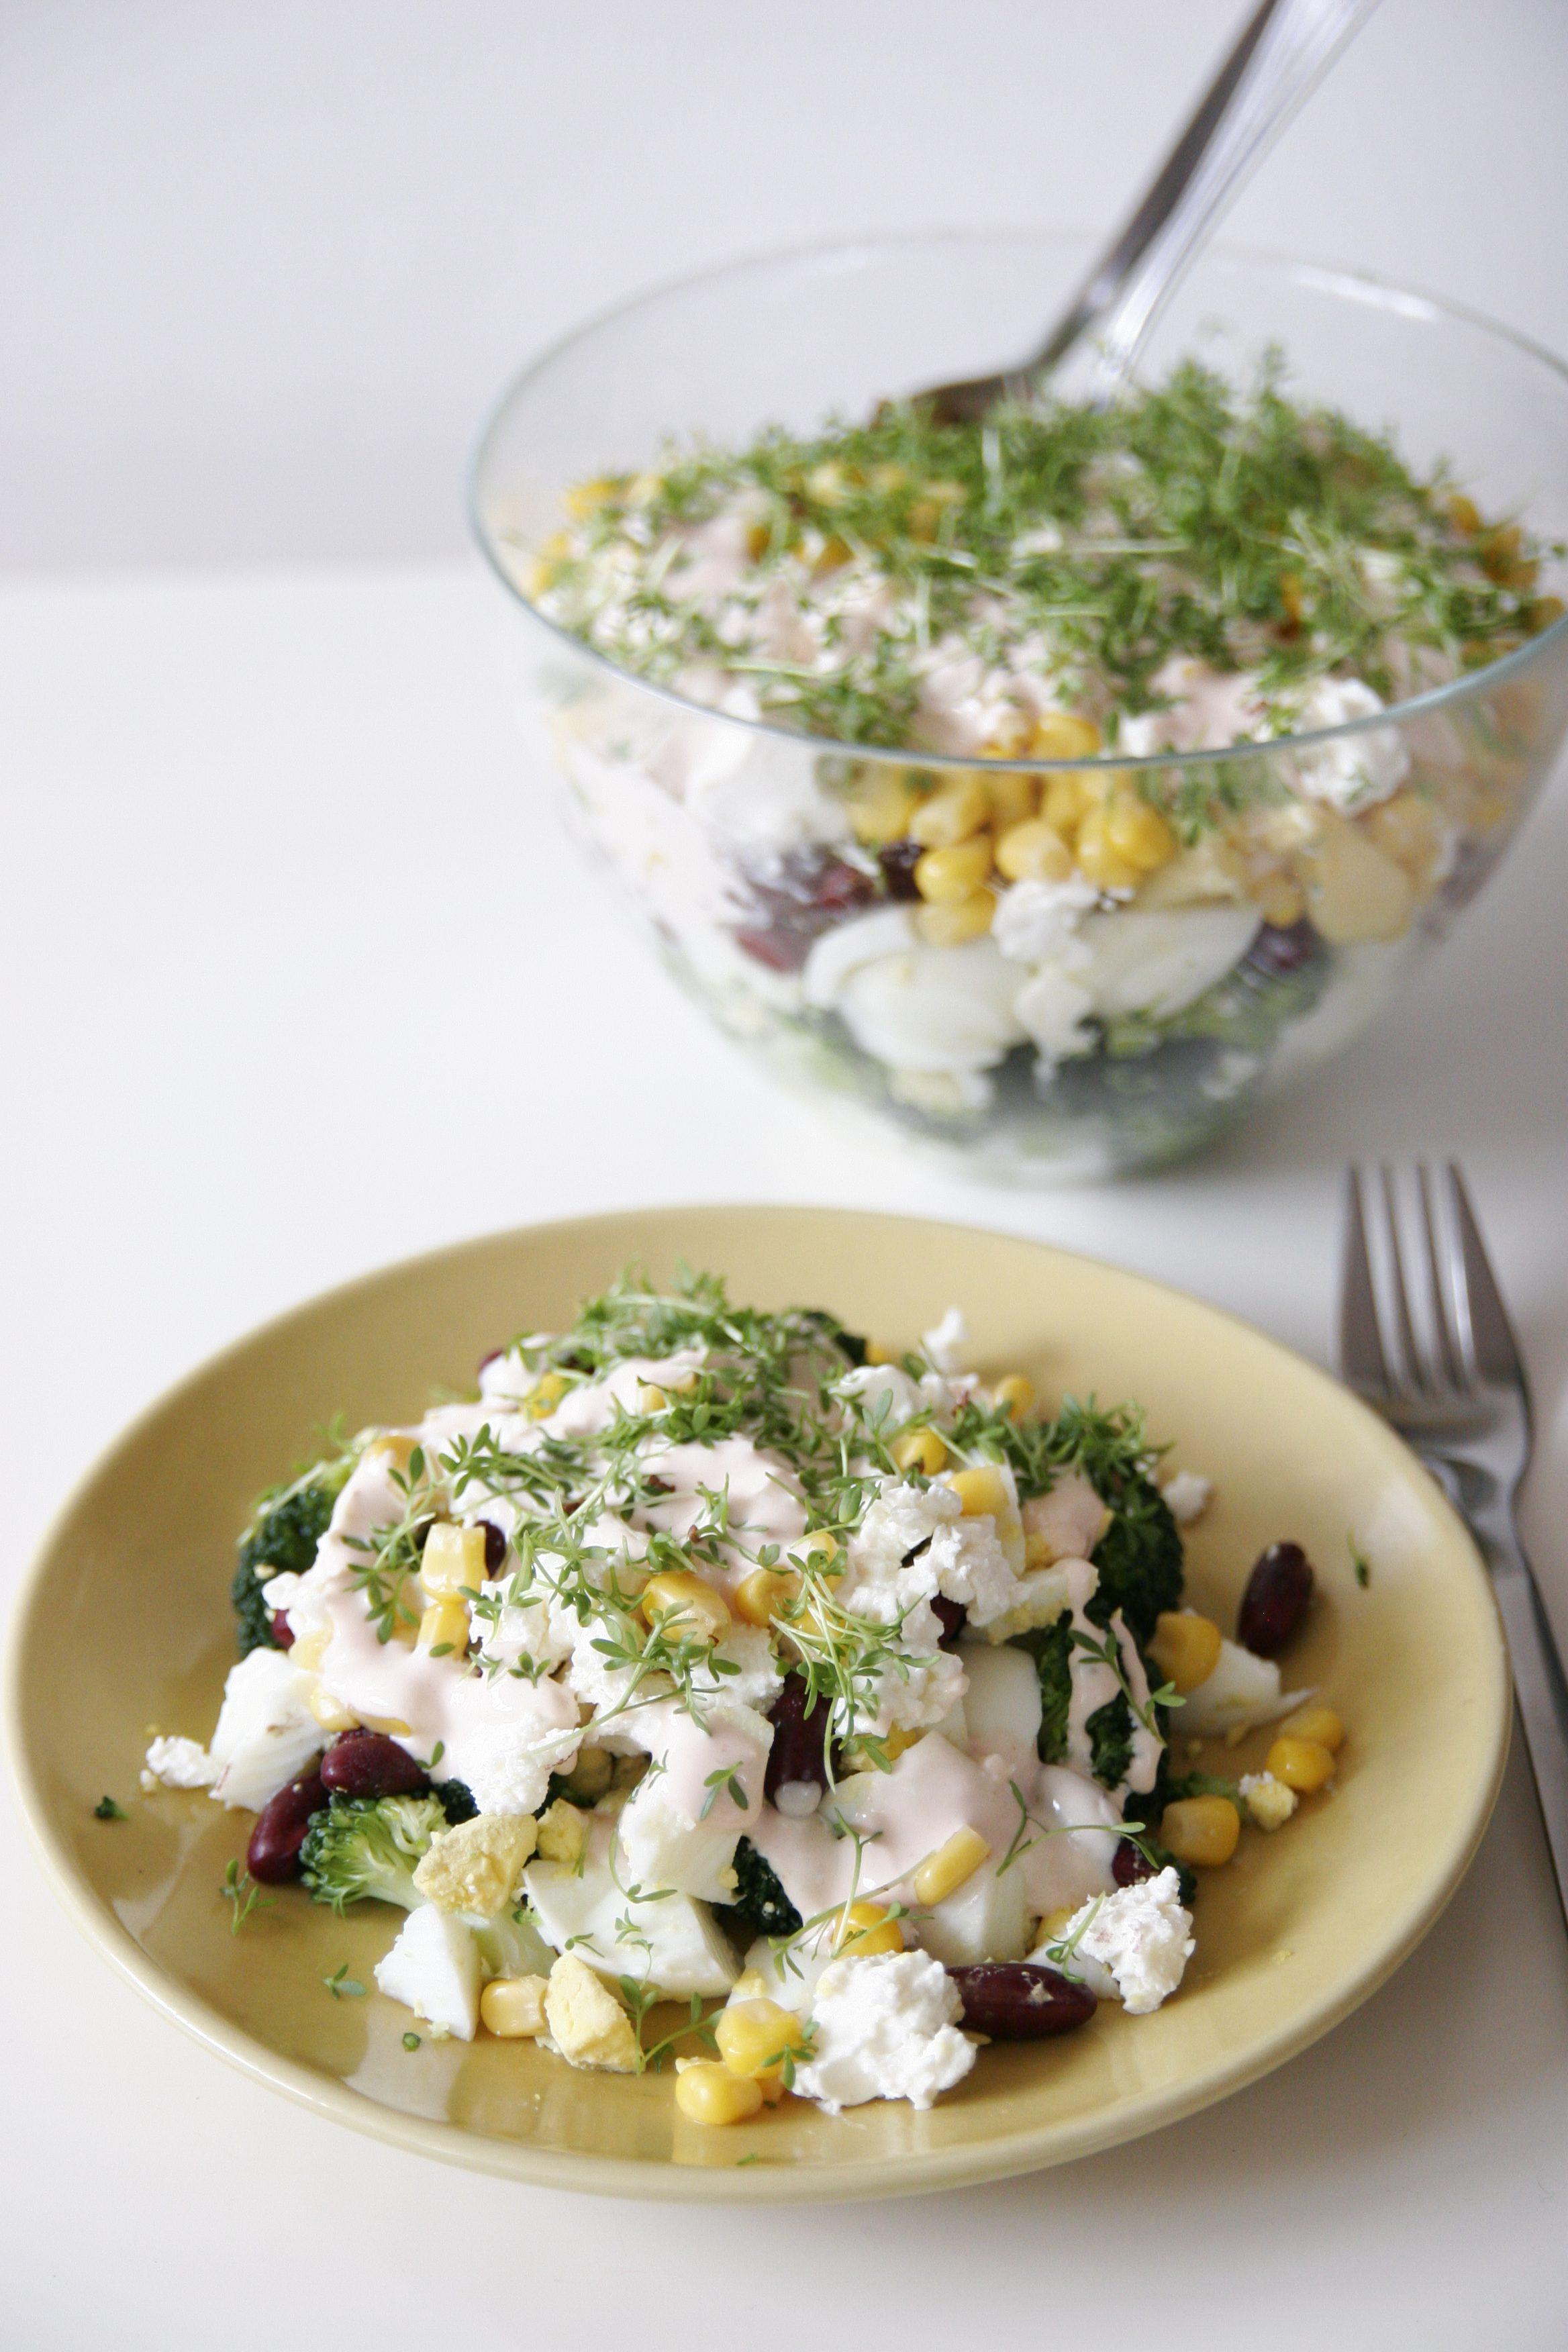 Salatka Z Brokulami Feta I Jajkiem Qulinarna